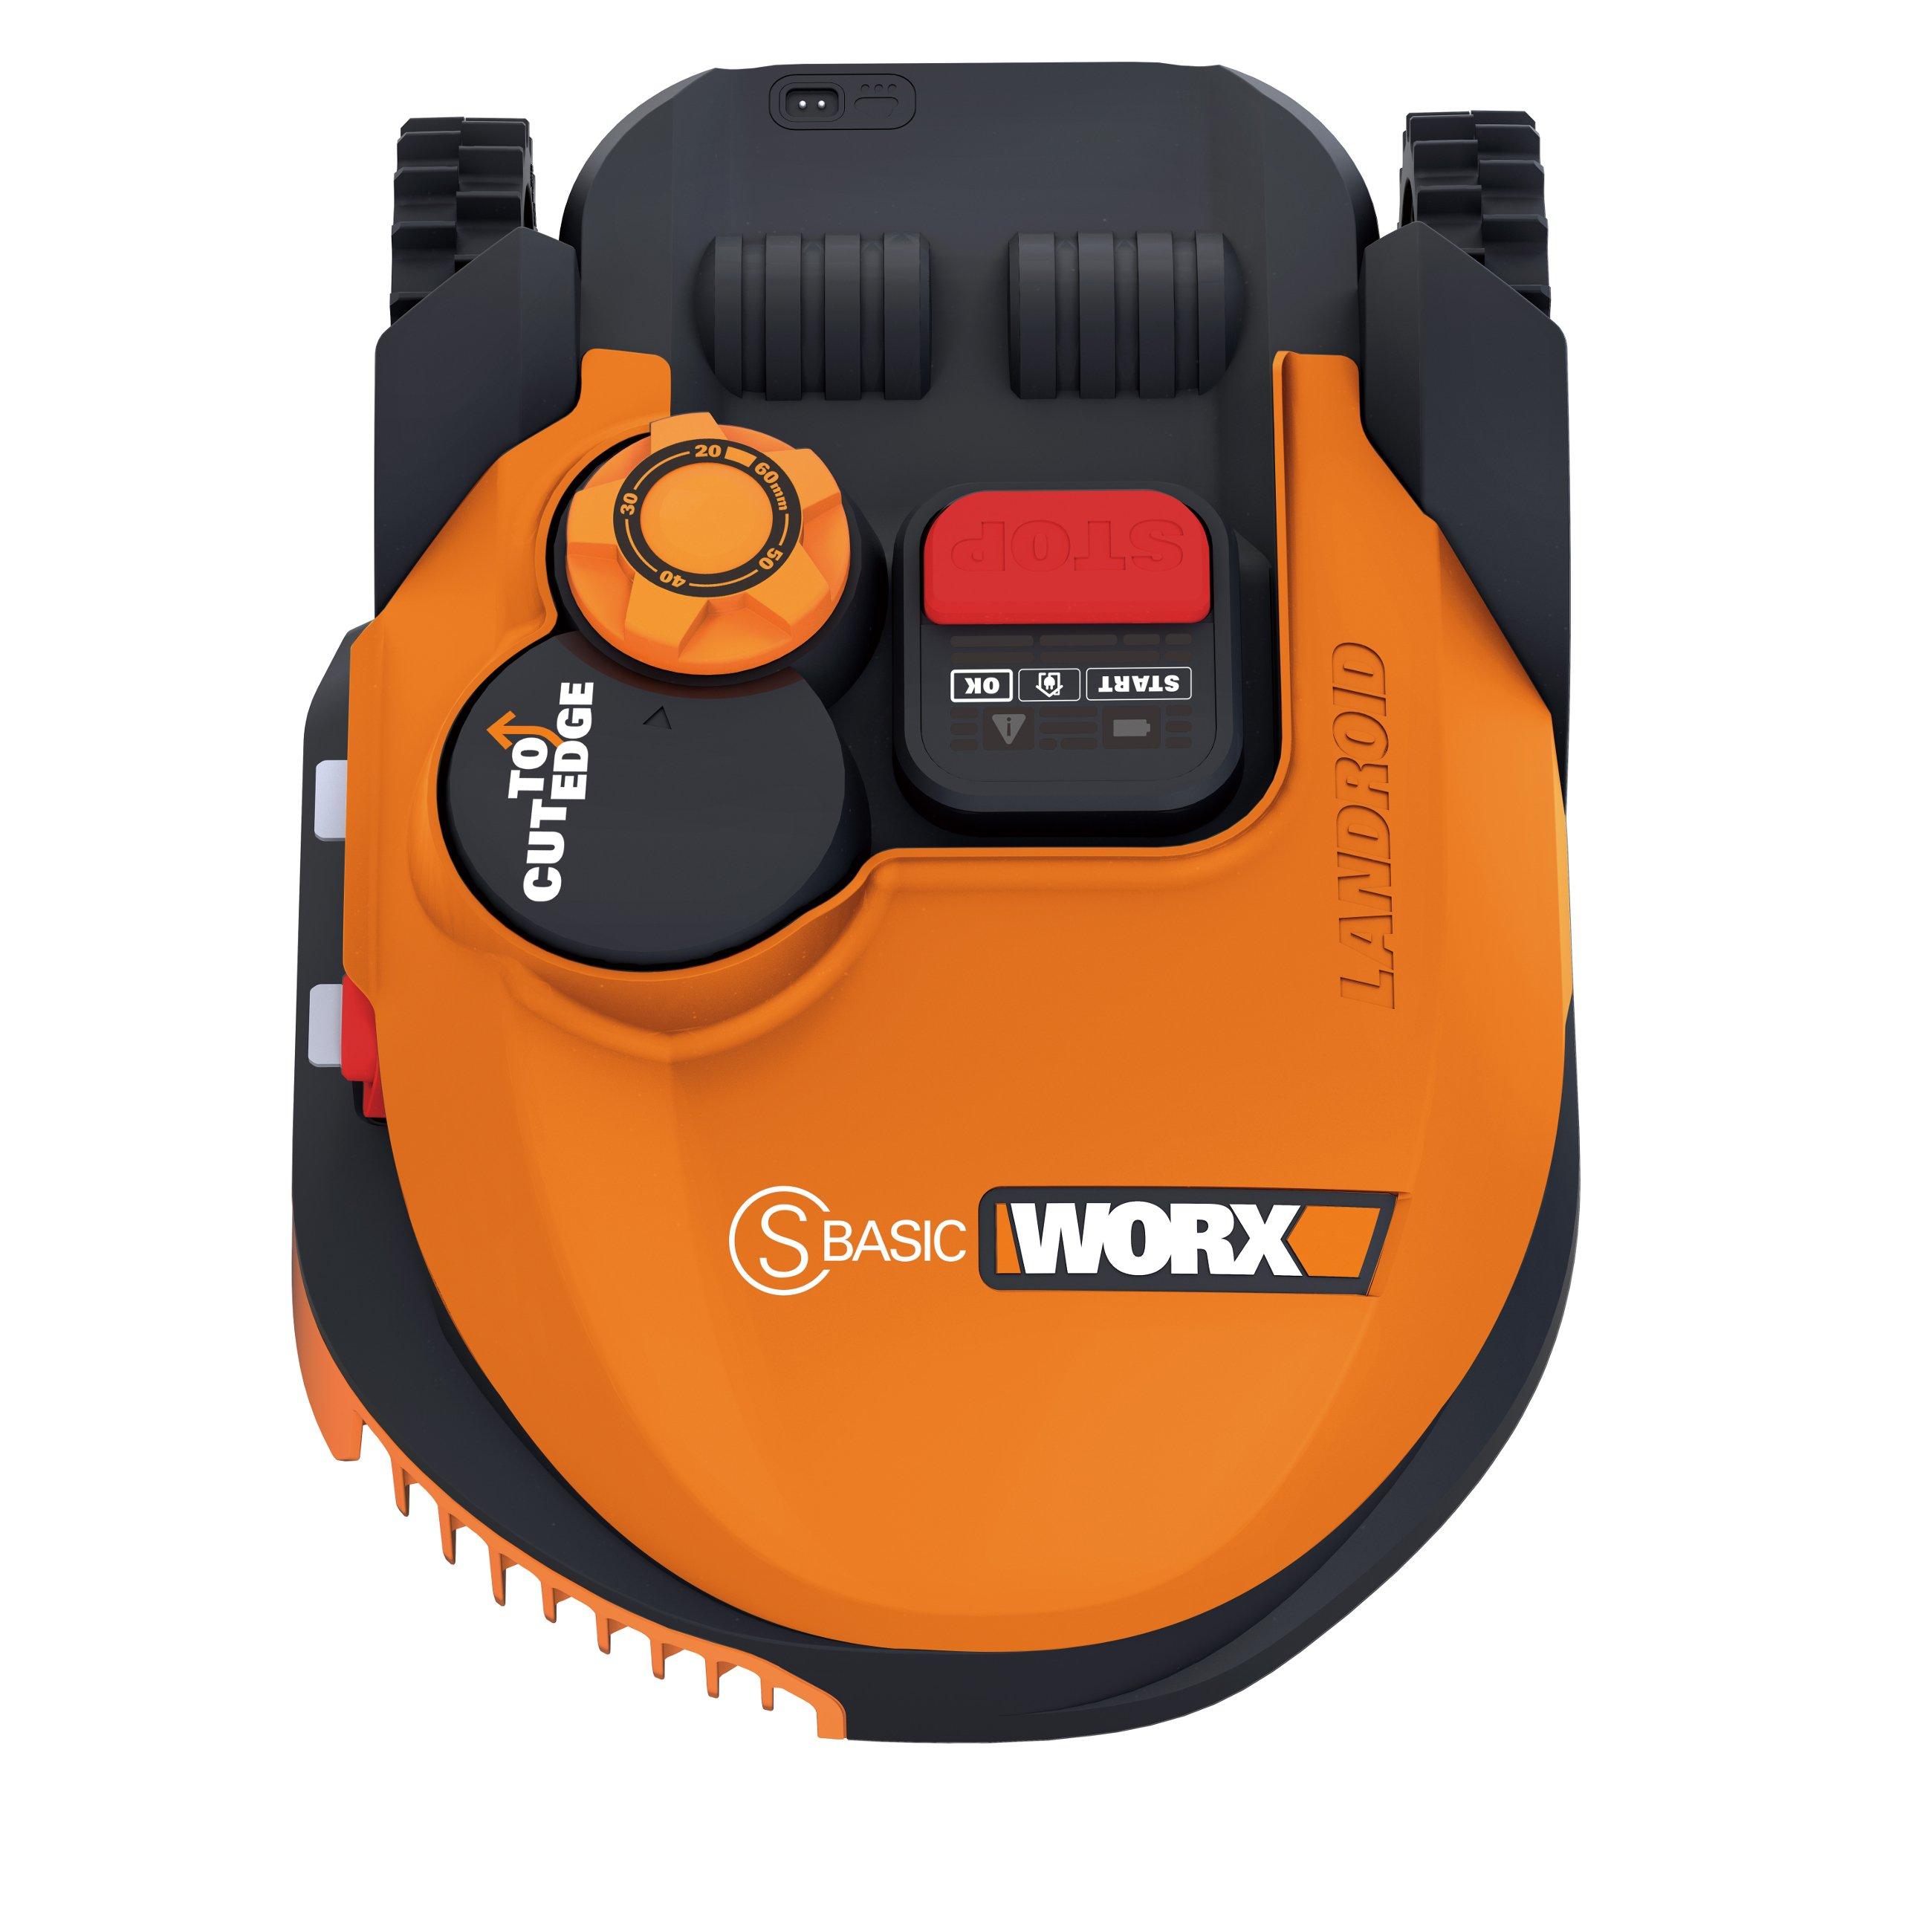 worx-wr090s-landroid-sbasic-rasen-maeh-roboter-2